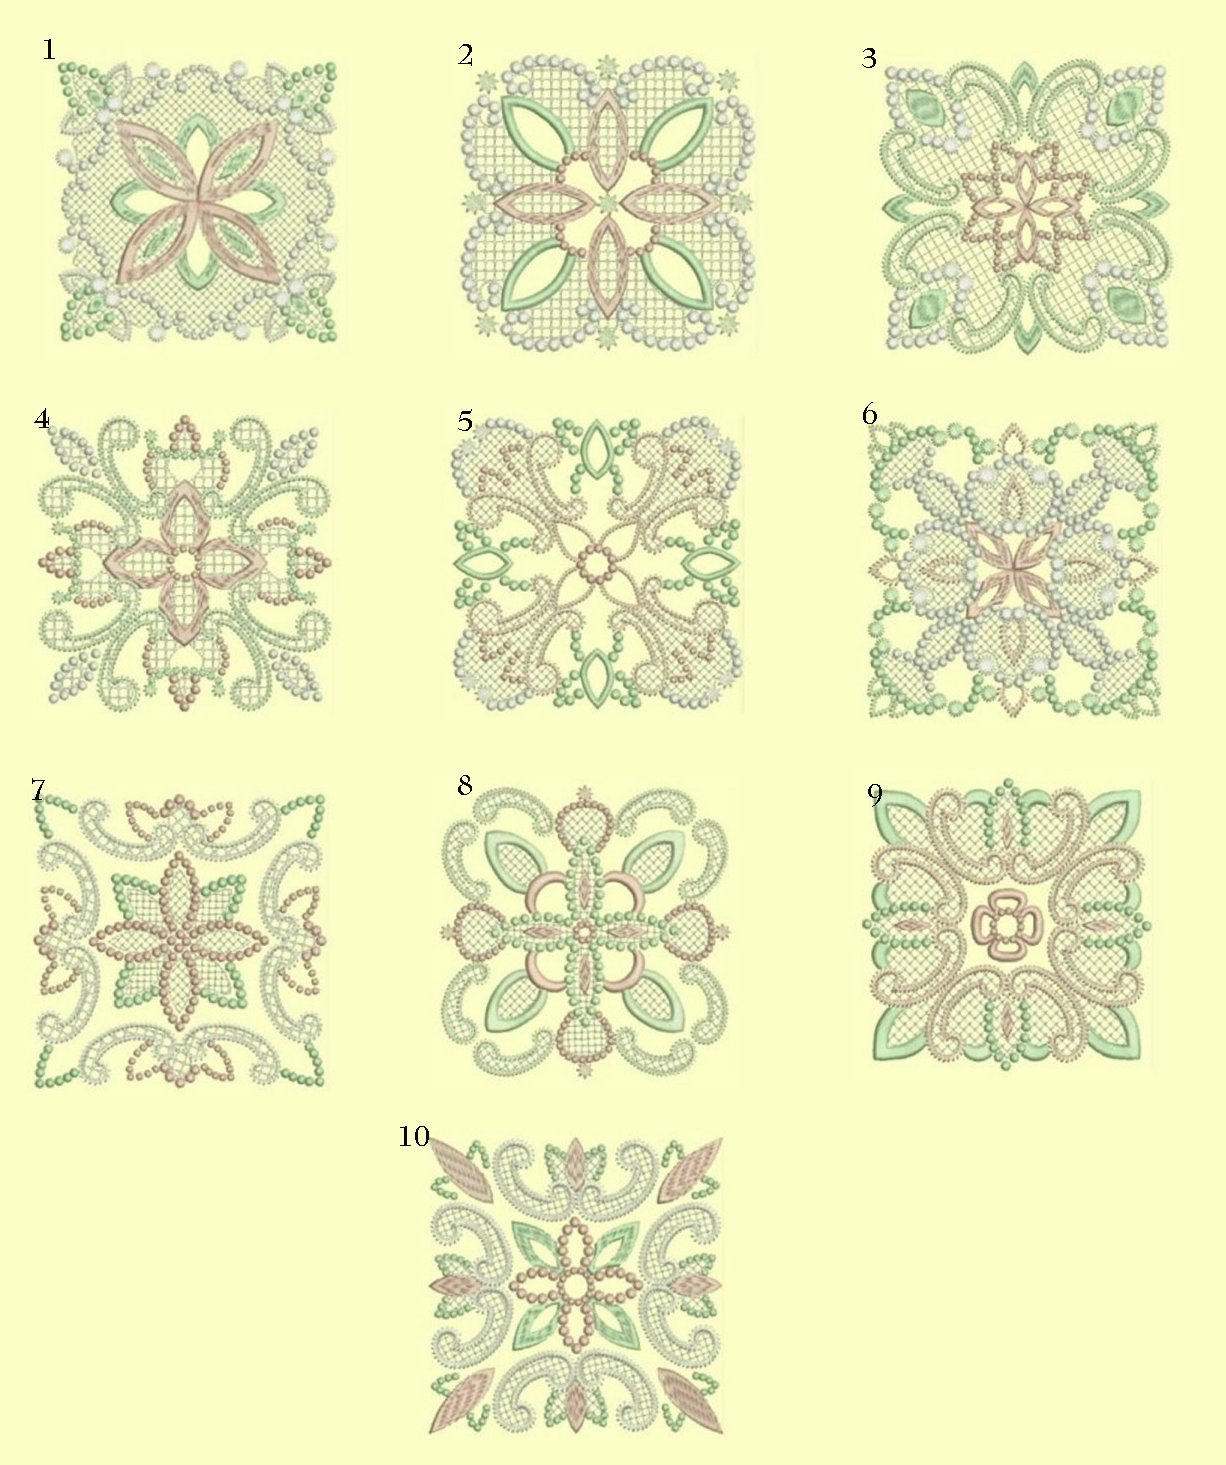 Candlewick & Satin 2 Quilt Blocks-ala carte single designs